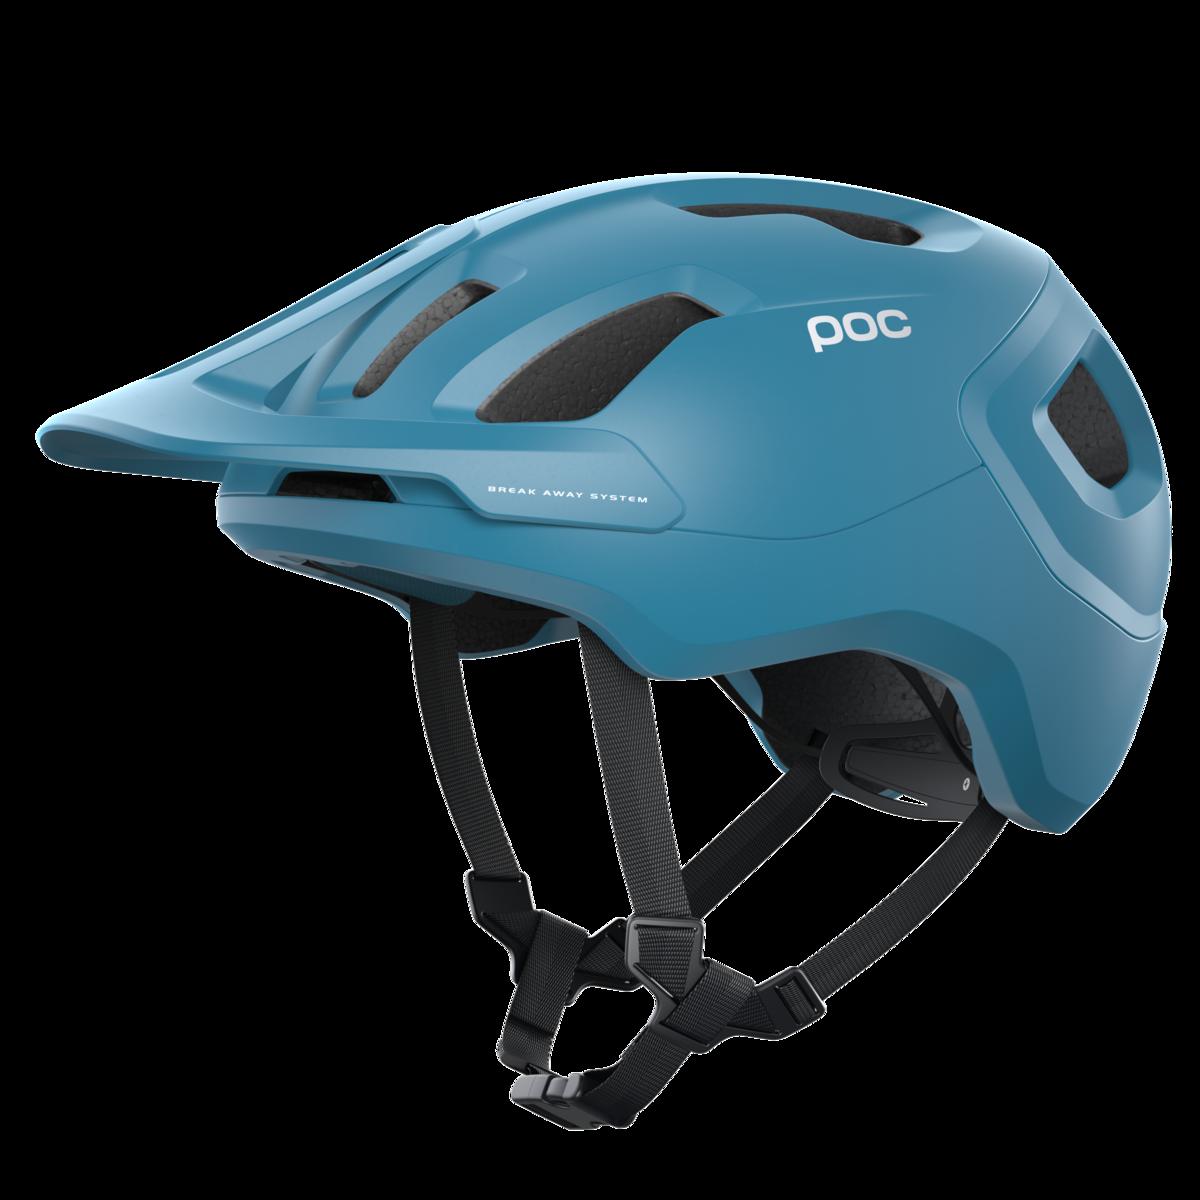 POC POC Axion Spin Helmet